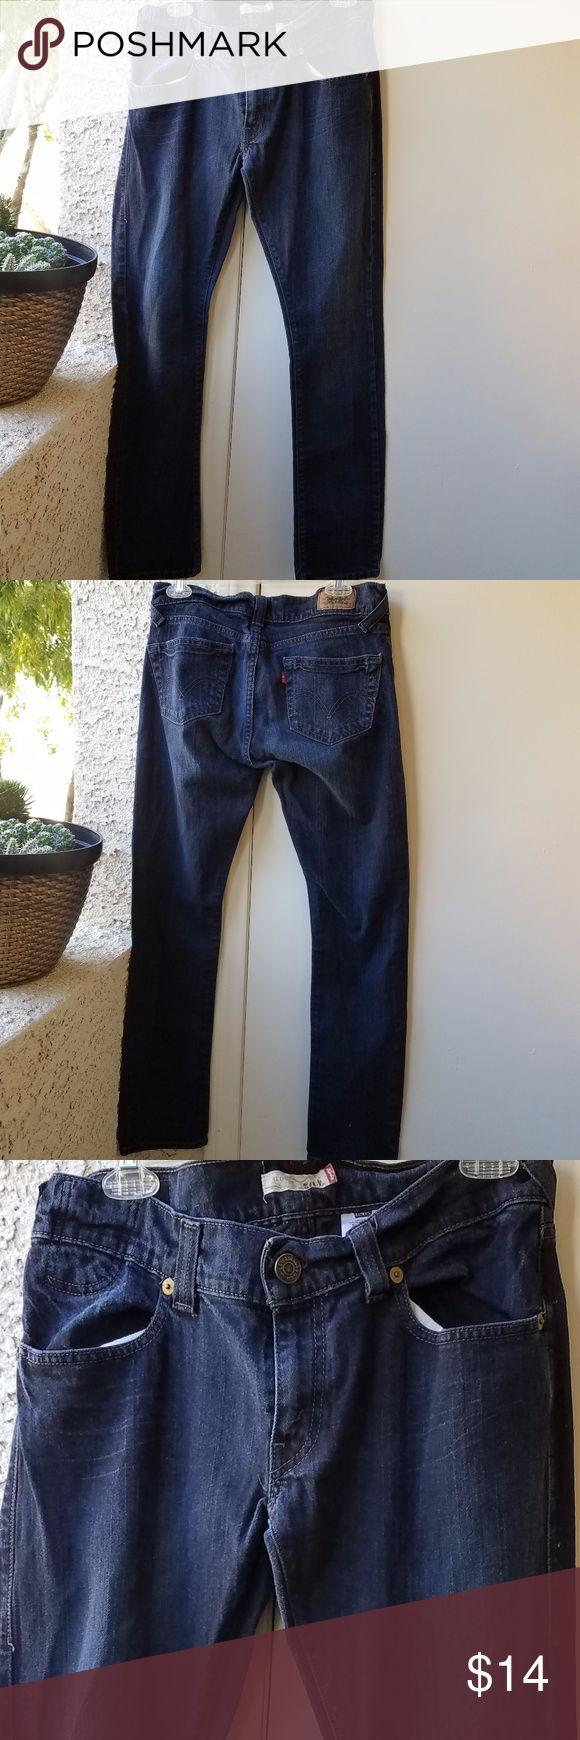 "LEVI'S Slouchy Skinny 504 Women's Dark Wash Jeans 99% cotton 1% spandex Measures 16"" across waist~20"" across hips~31"" inseam Excellent Condition Levi's Pants Skinny"